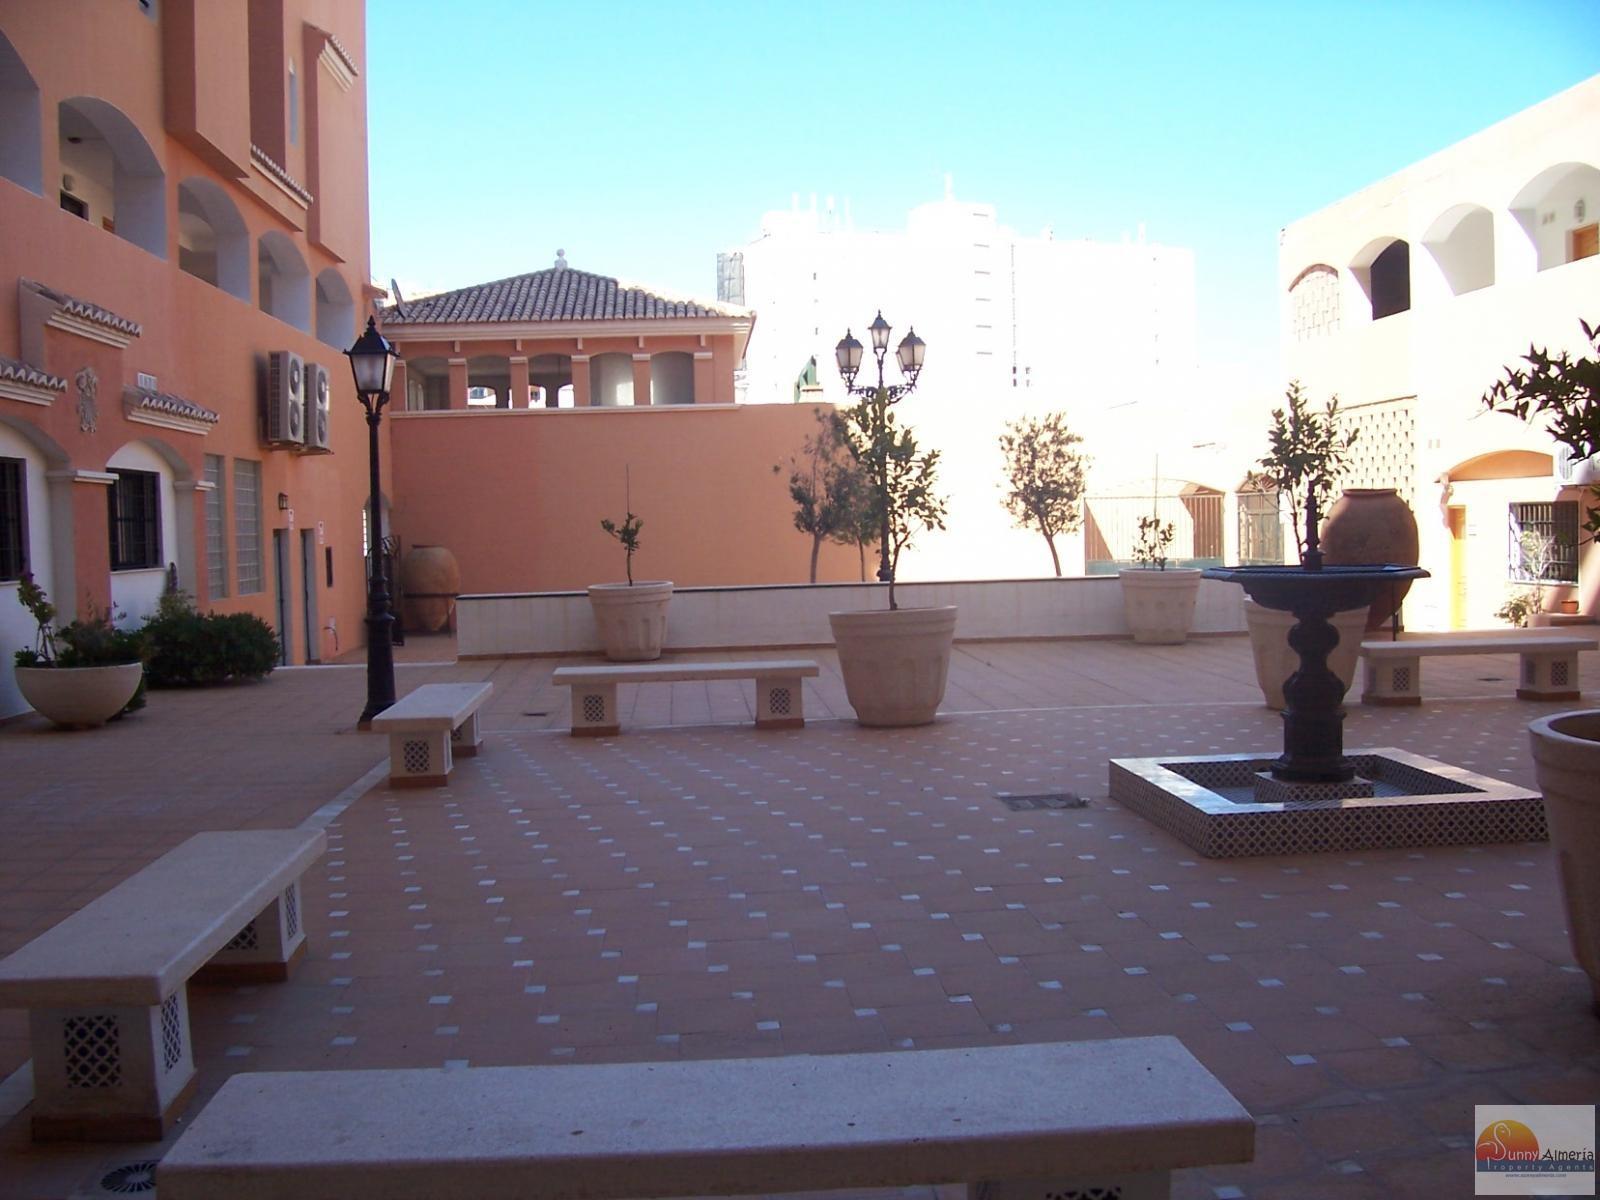 Apartment zur miete in calle alameda 69 (Roquetas de Mar), 500 €/Monat (Saison)